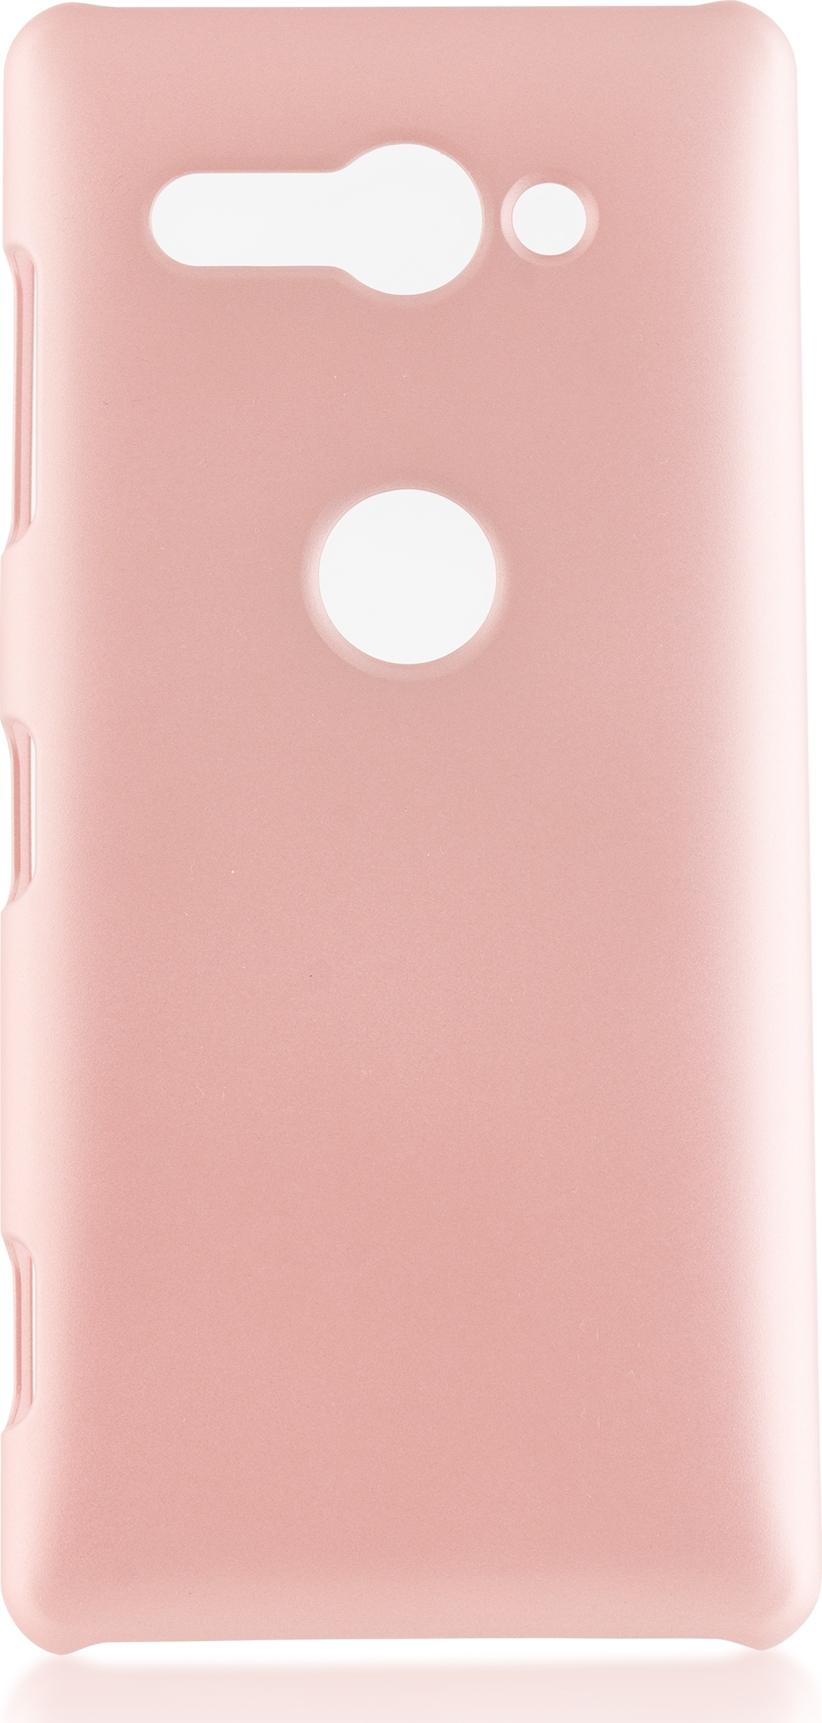 Чехол Brosco Soft-Touch для Sony Xperia XZ2 Compact, розовый чехол для сотового телефона brosco двухсторонний soft touch для sony xz2 xz2 softtouch pink розовый